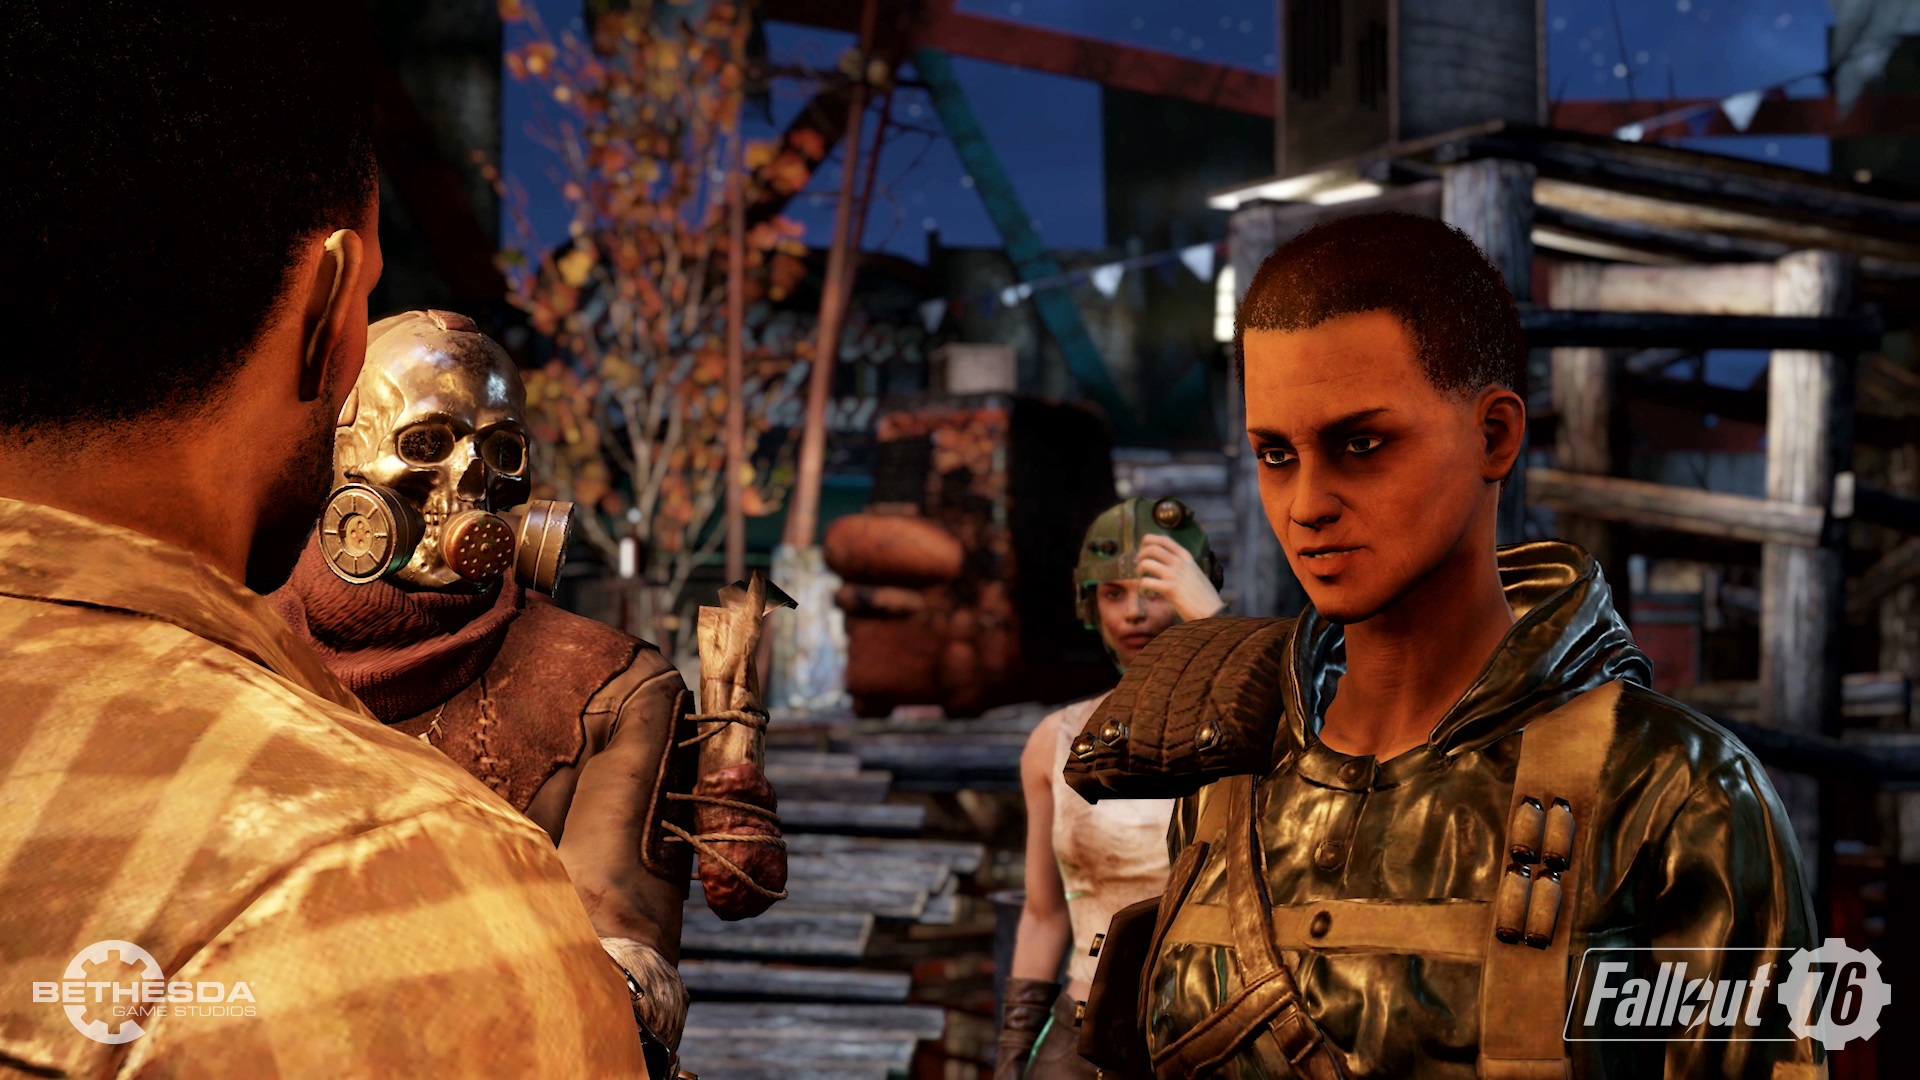 Fallout 76's NPCs stay quarantined for an extra week screenshot